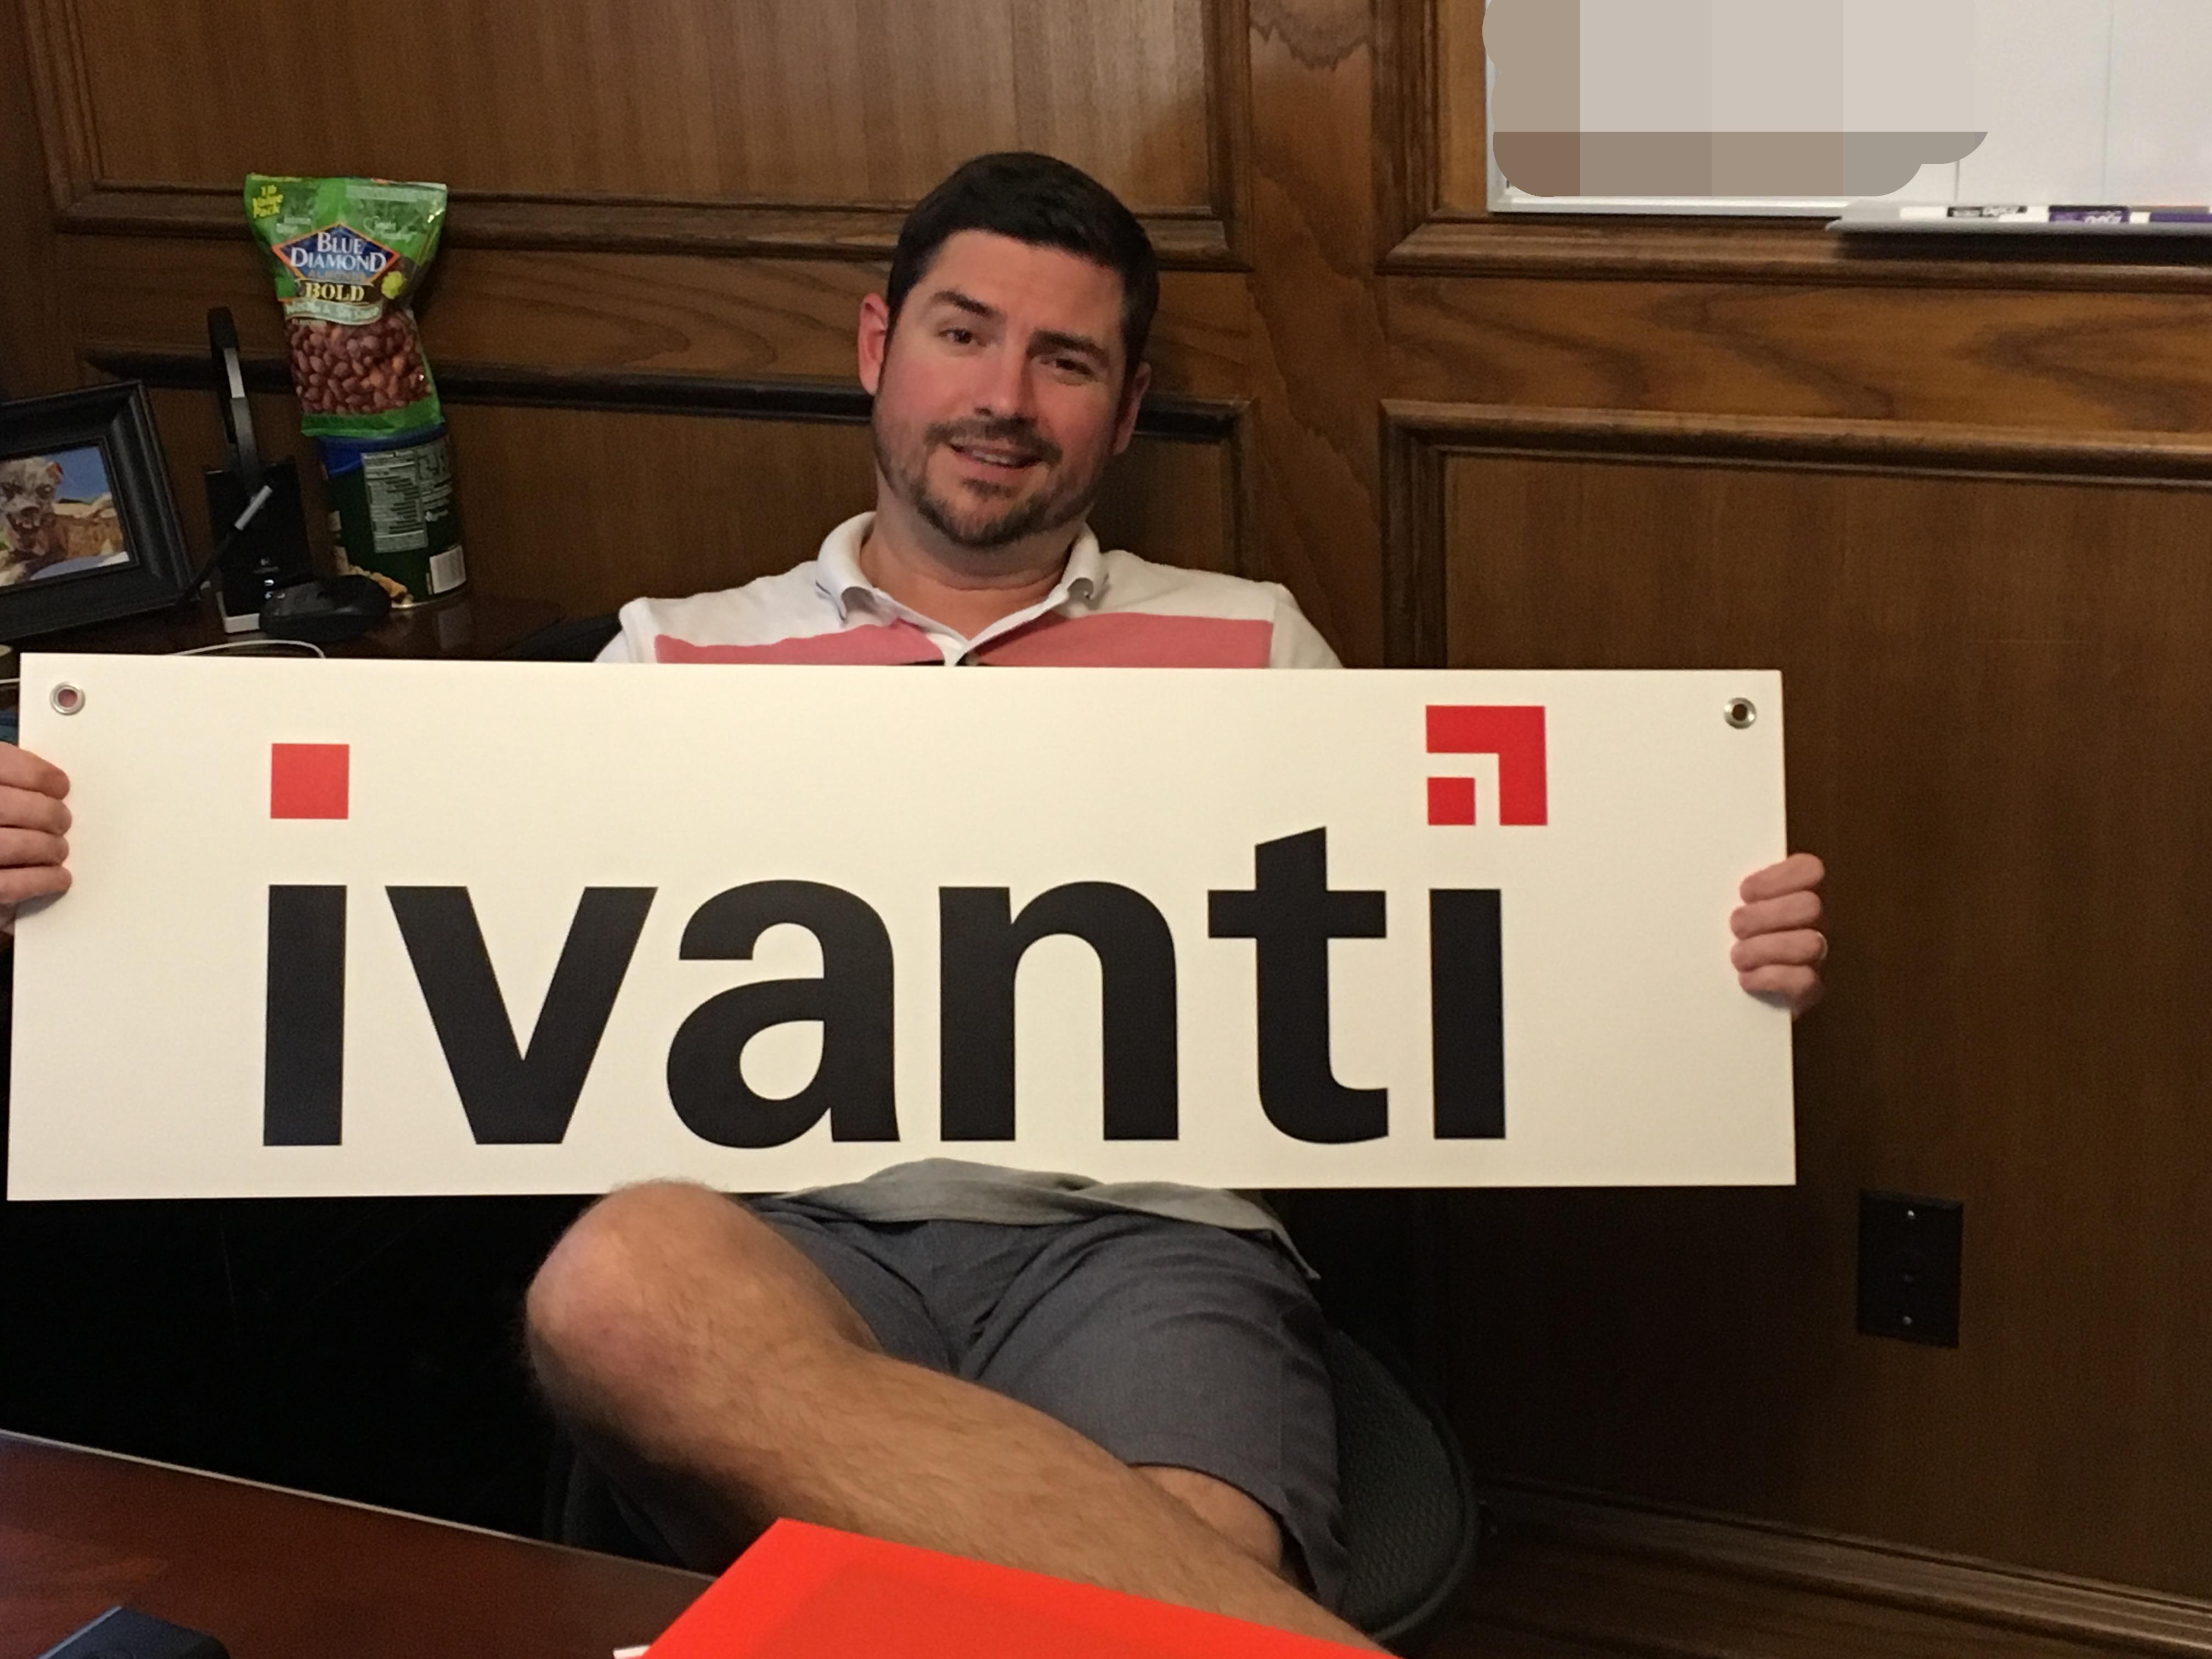 Thanks Ivanti!